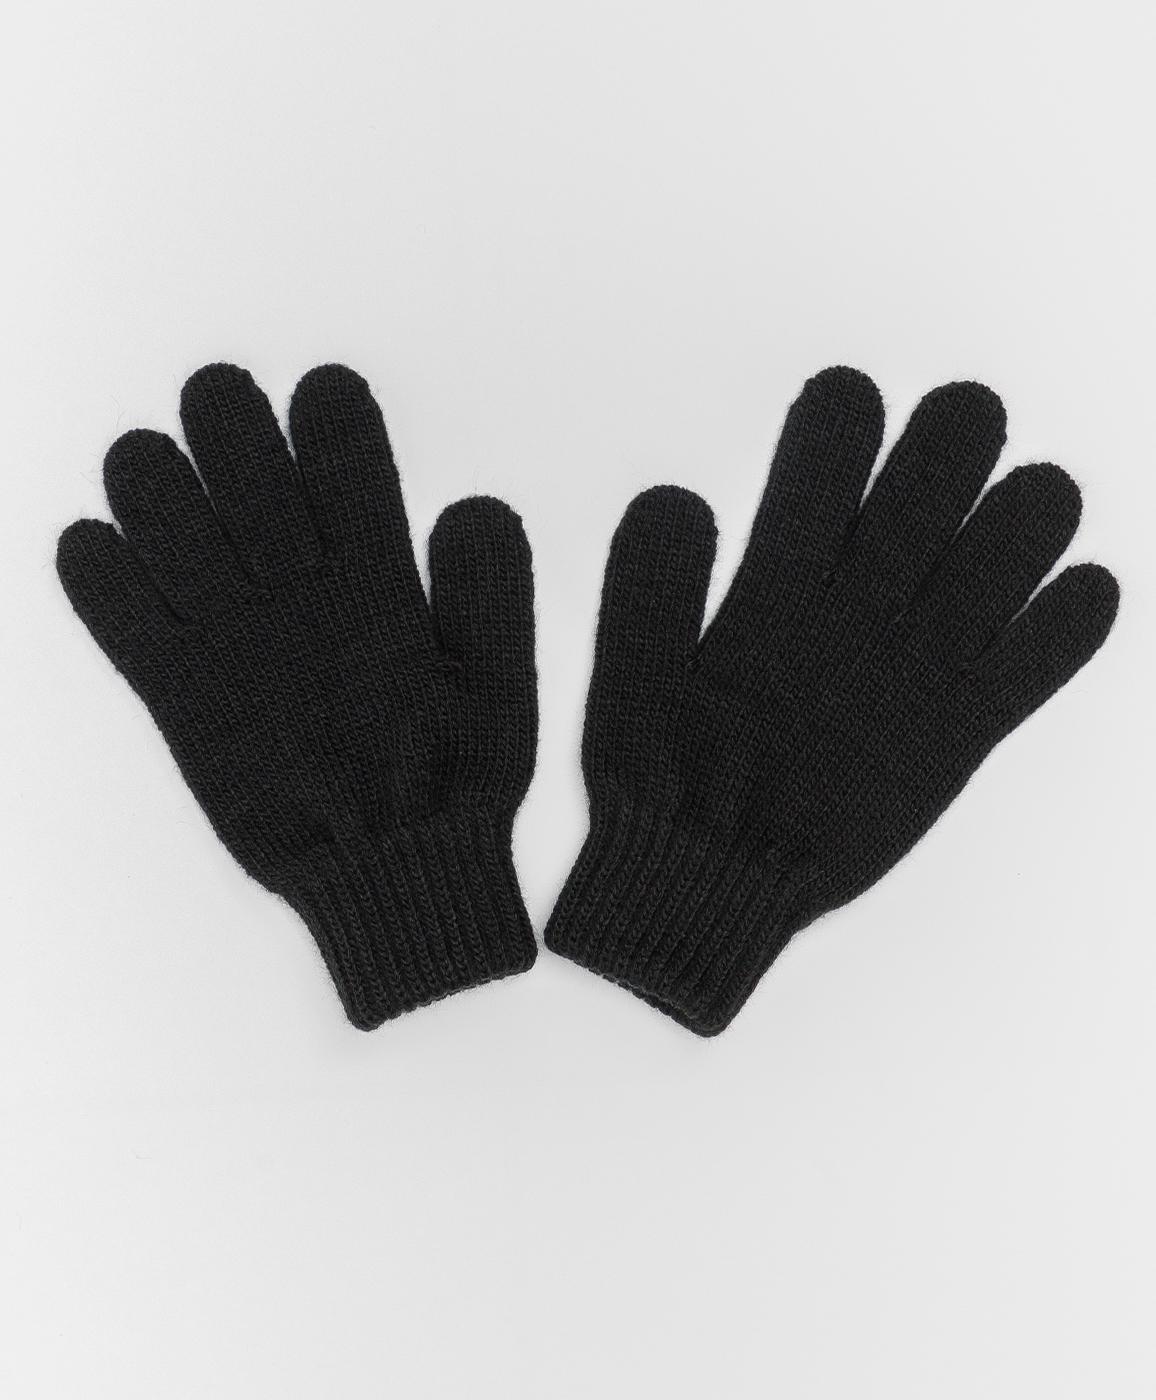 Купить 220BBGJX76010800, Черные вязаные перчатки Button Blue, 18, Женский, Зима, ОСЕНЬ/ЗИМА 2020-2021 (shop: GulliverMarket Gulliver Market)